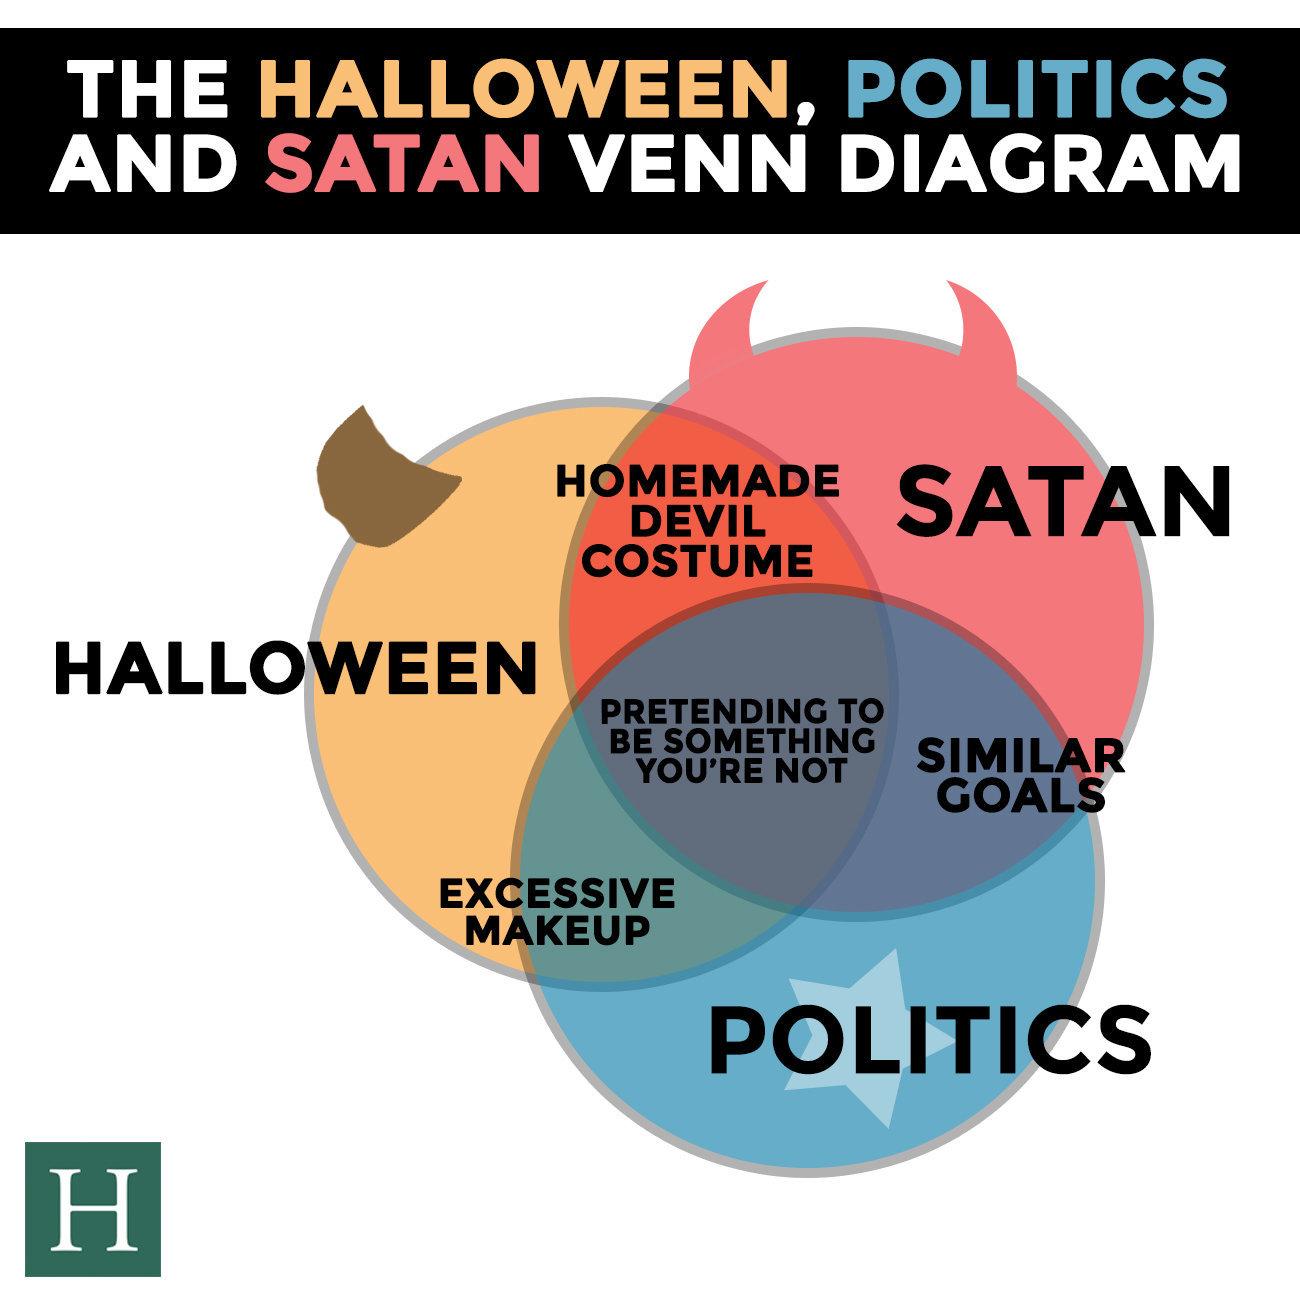 one diagram shows how halloween politics and satan are the same venn diagram maker microsoft venn diagram makeup [ 1300 x 1300 Pixel ]